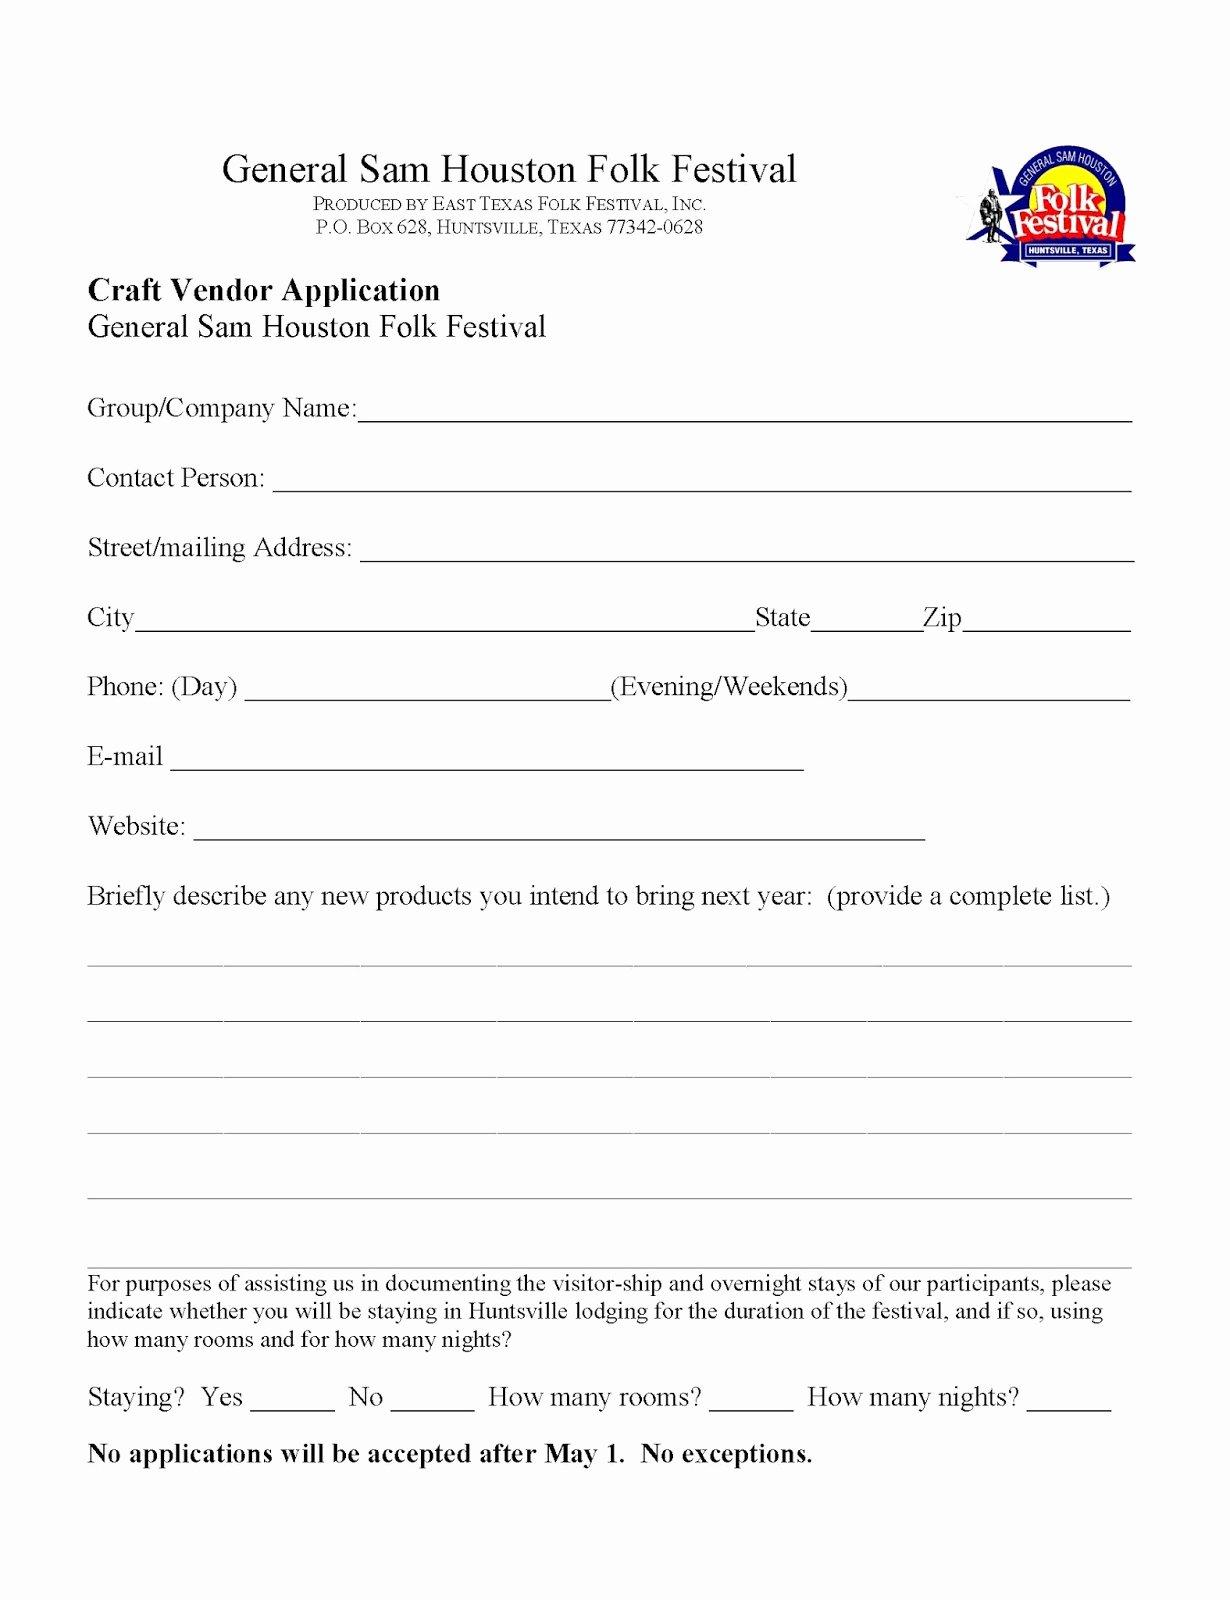 Vendor Application form Template Unique General Sam Houston Folk Festival Craft Vendor Application